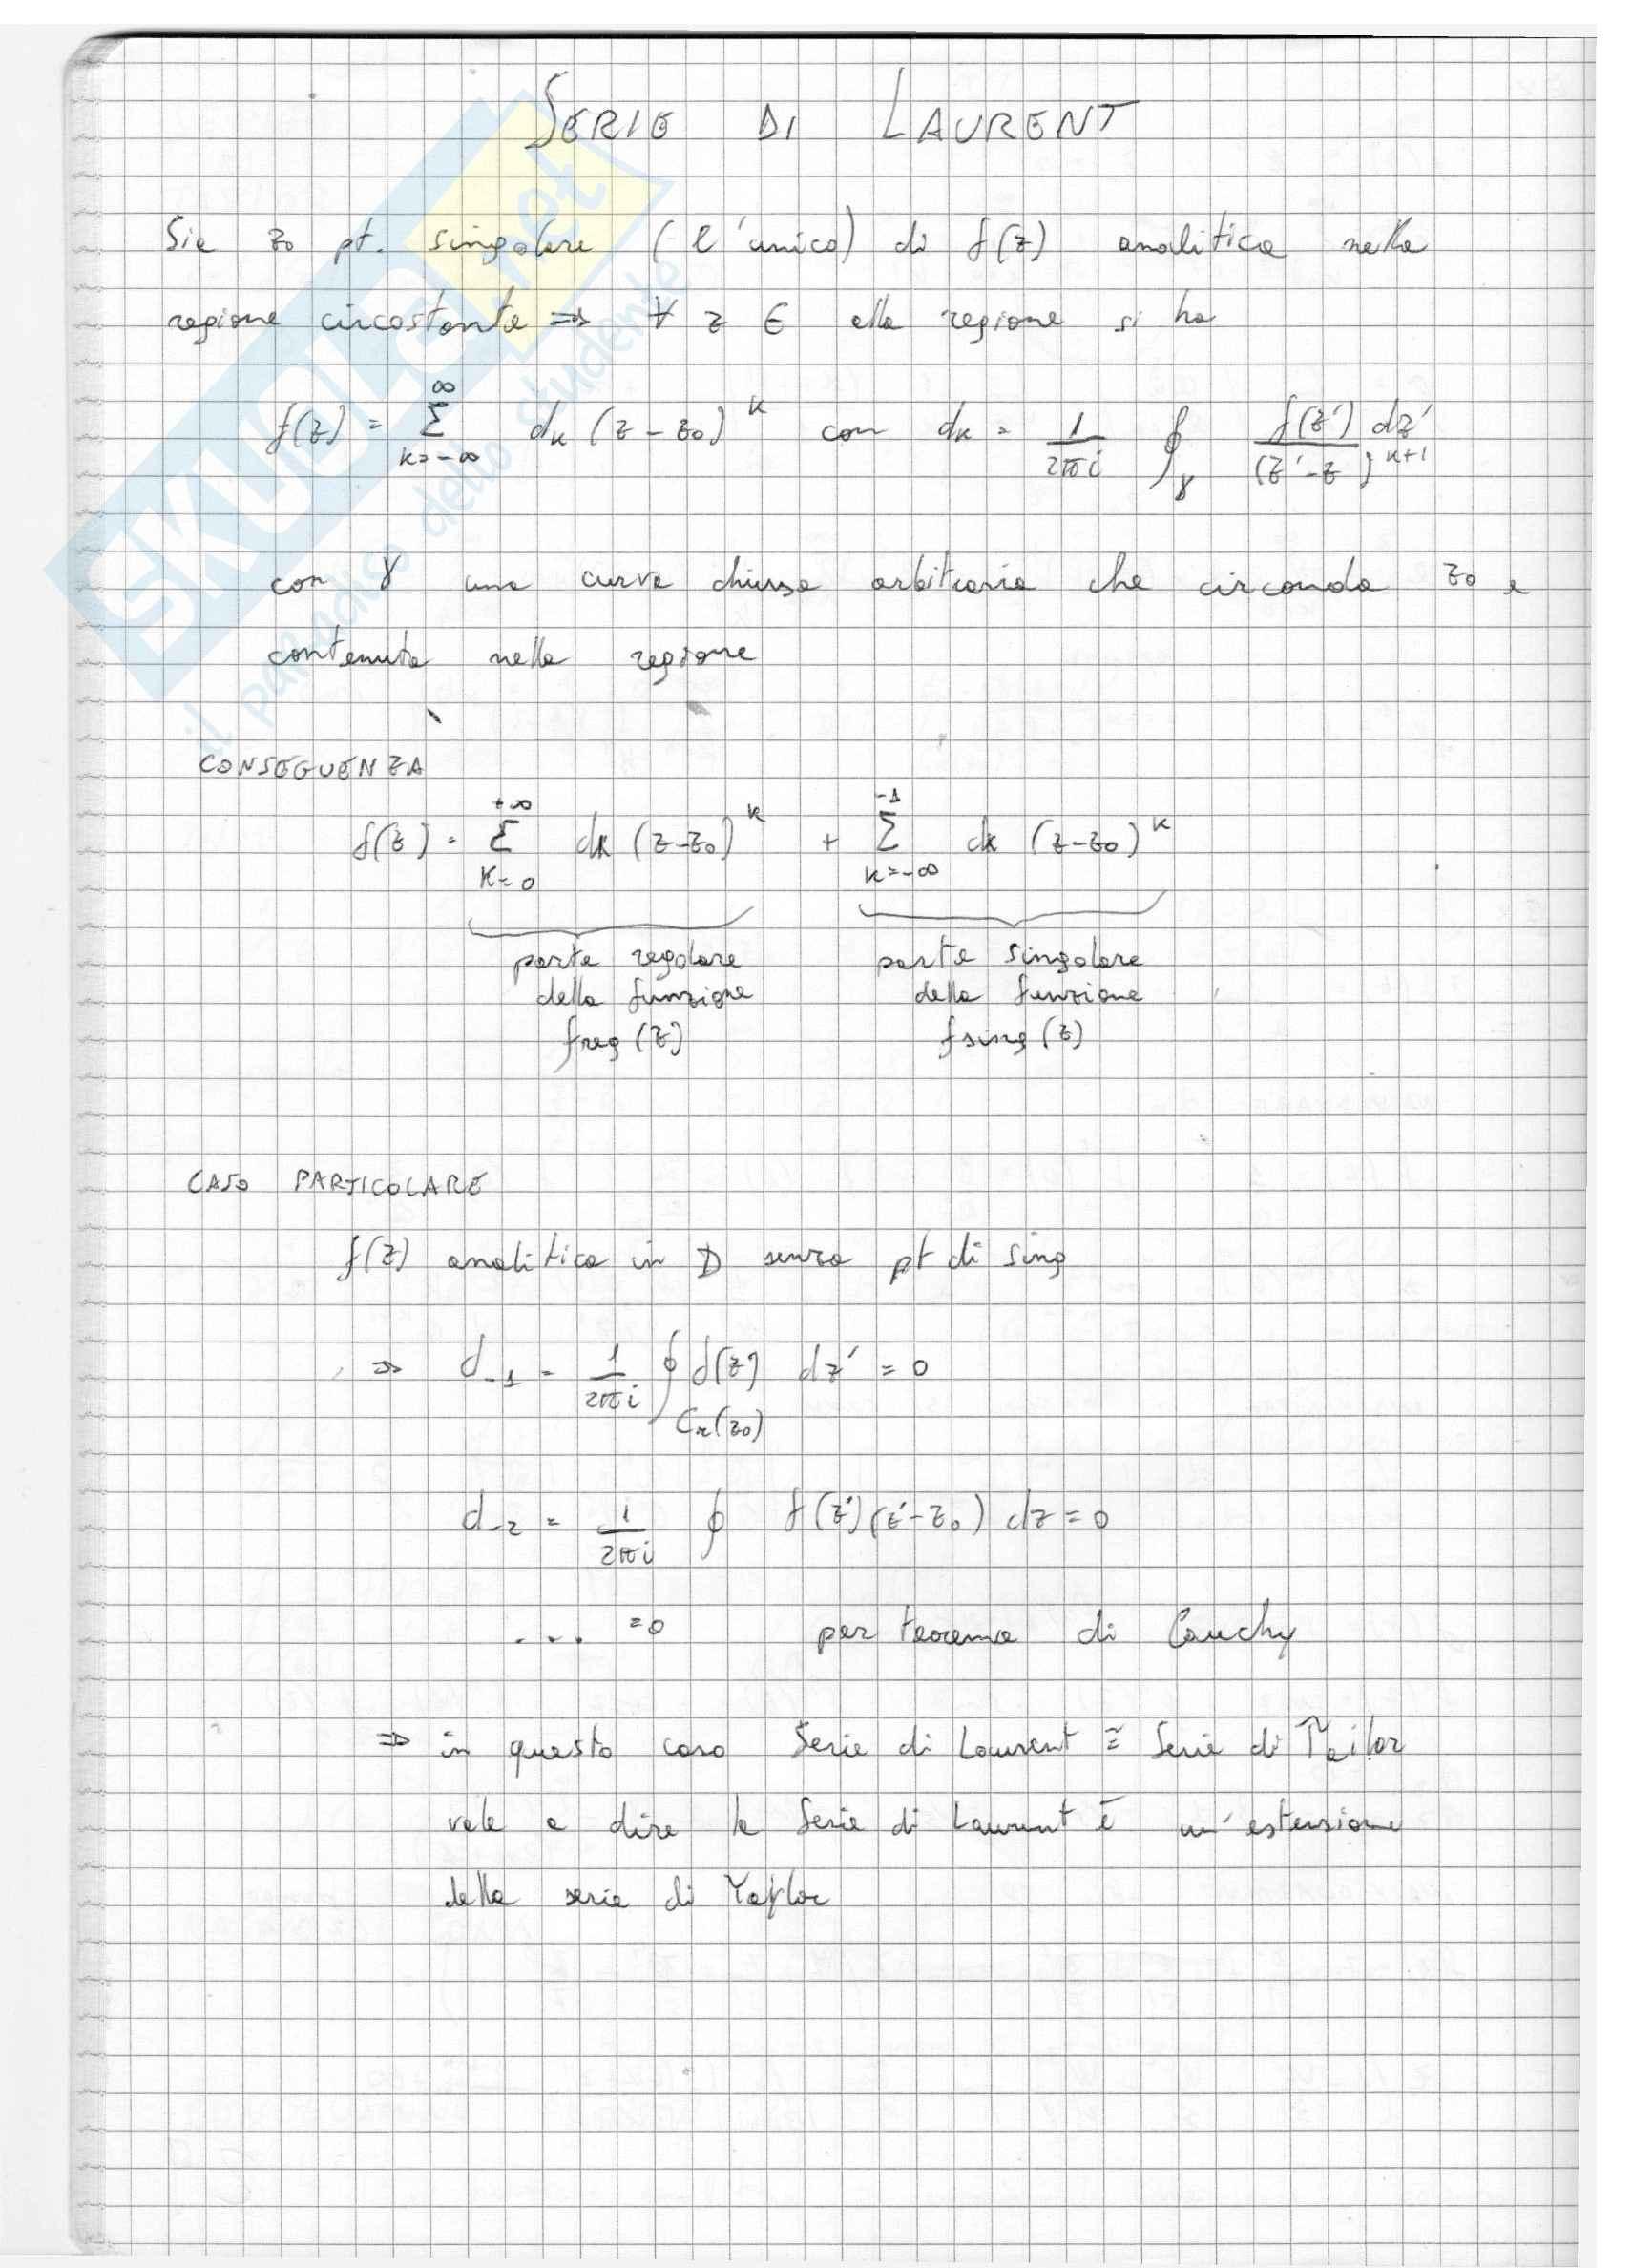 Fisica Matematica Pag. 31